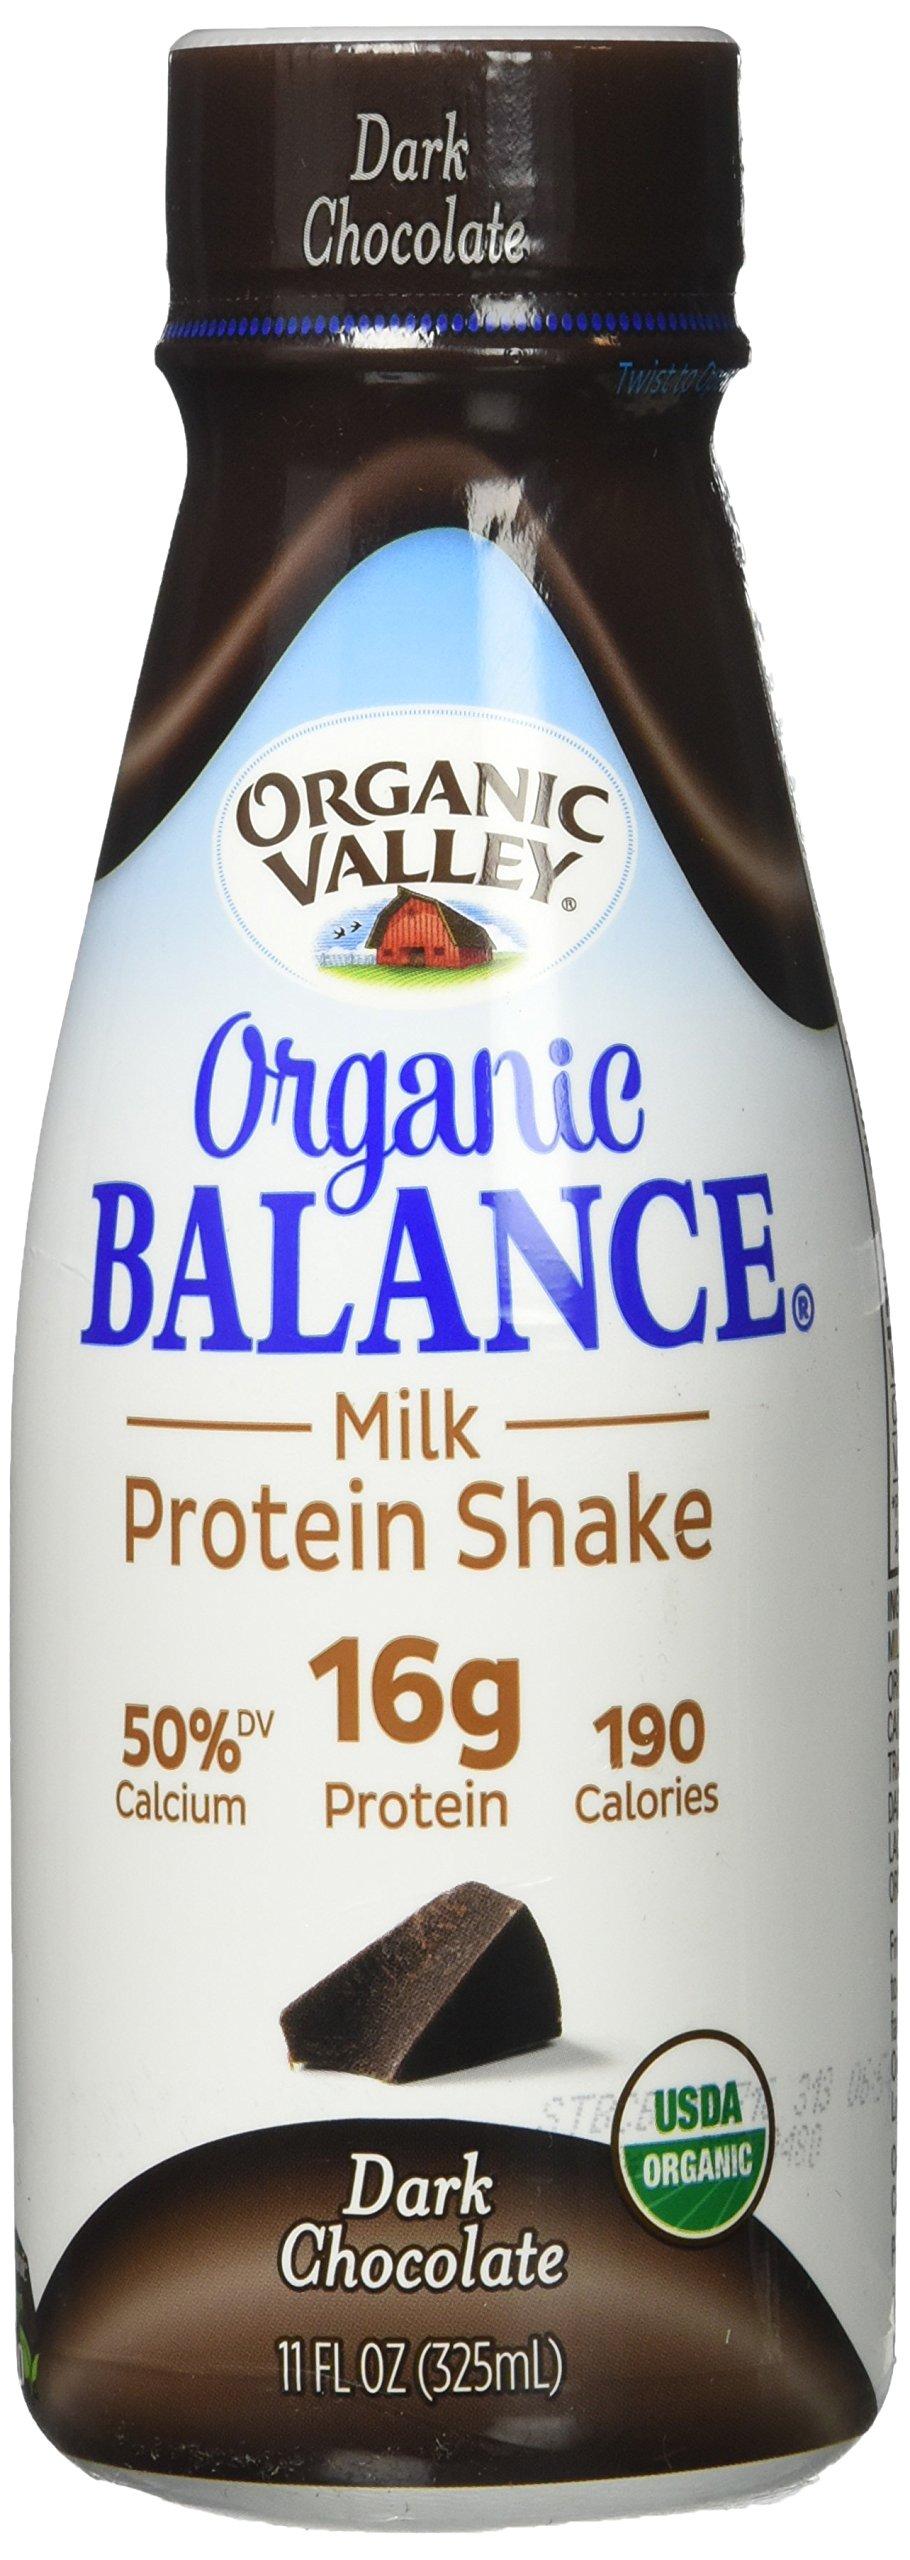 Organic Valley Organic Balance Milk Protein Shake - Chocolate - 11 Ounces, 12Ct